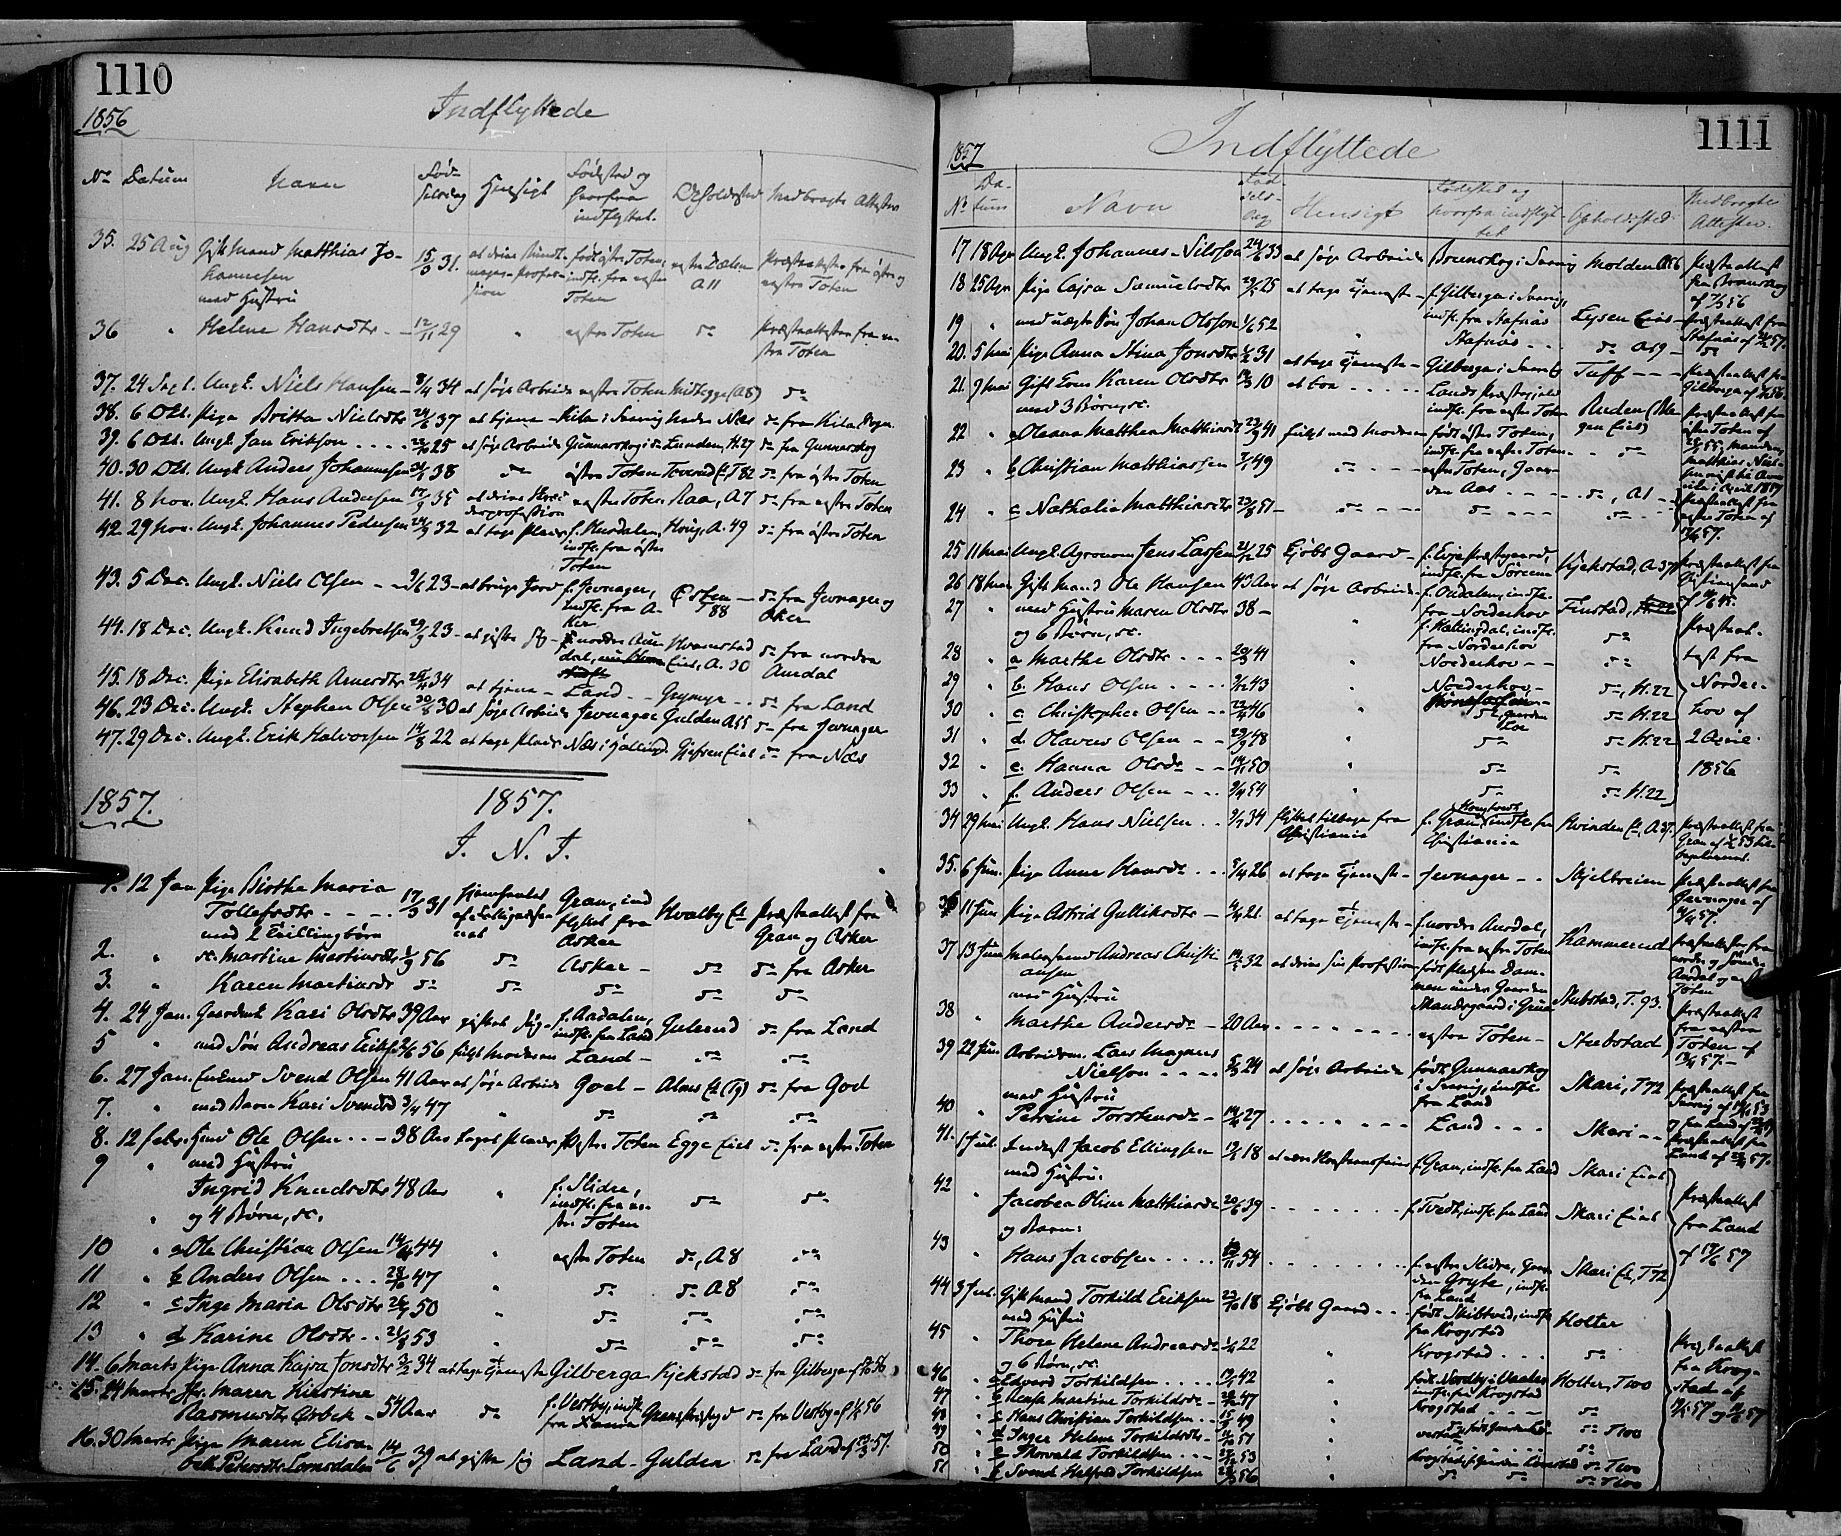 SAH, Gran prestekontor, Ministerialbok nr. 12, 1856-1874, s. 1110-1111